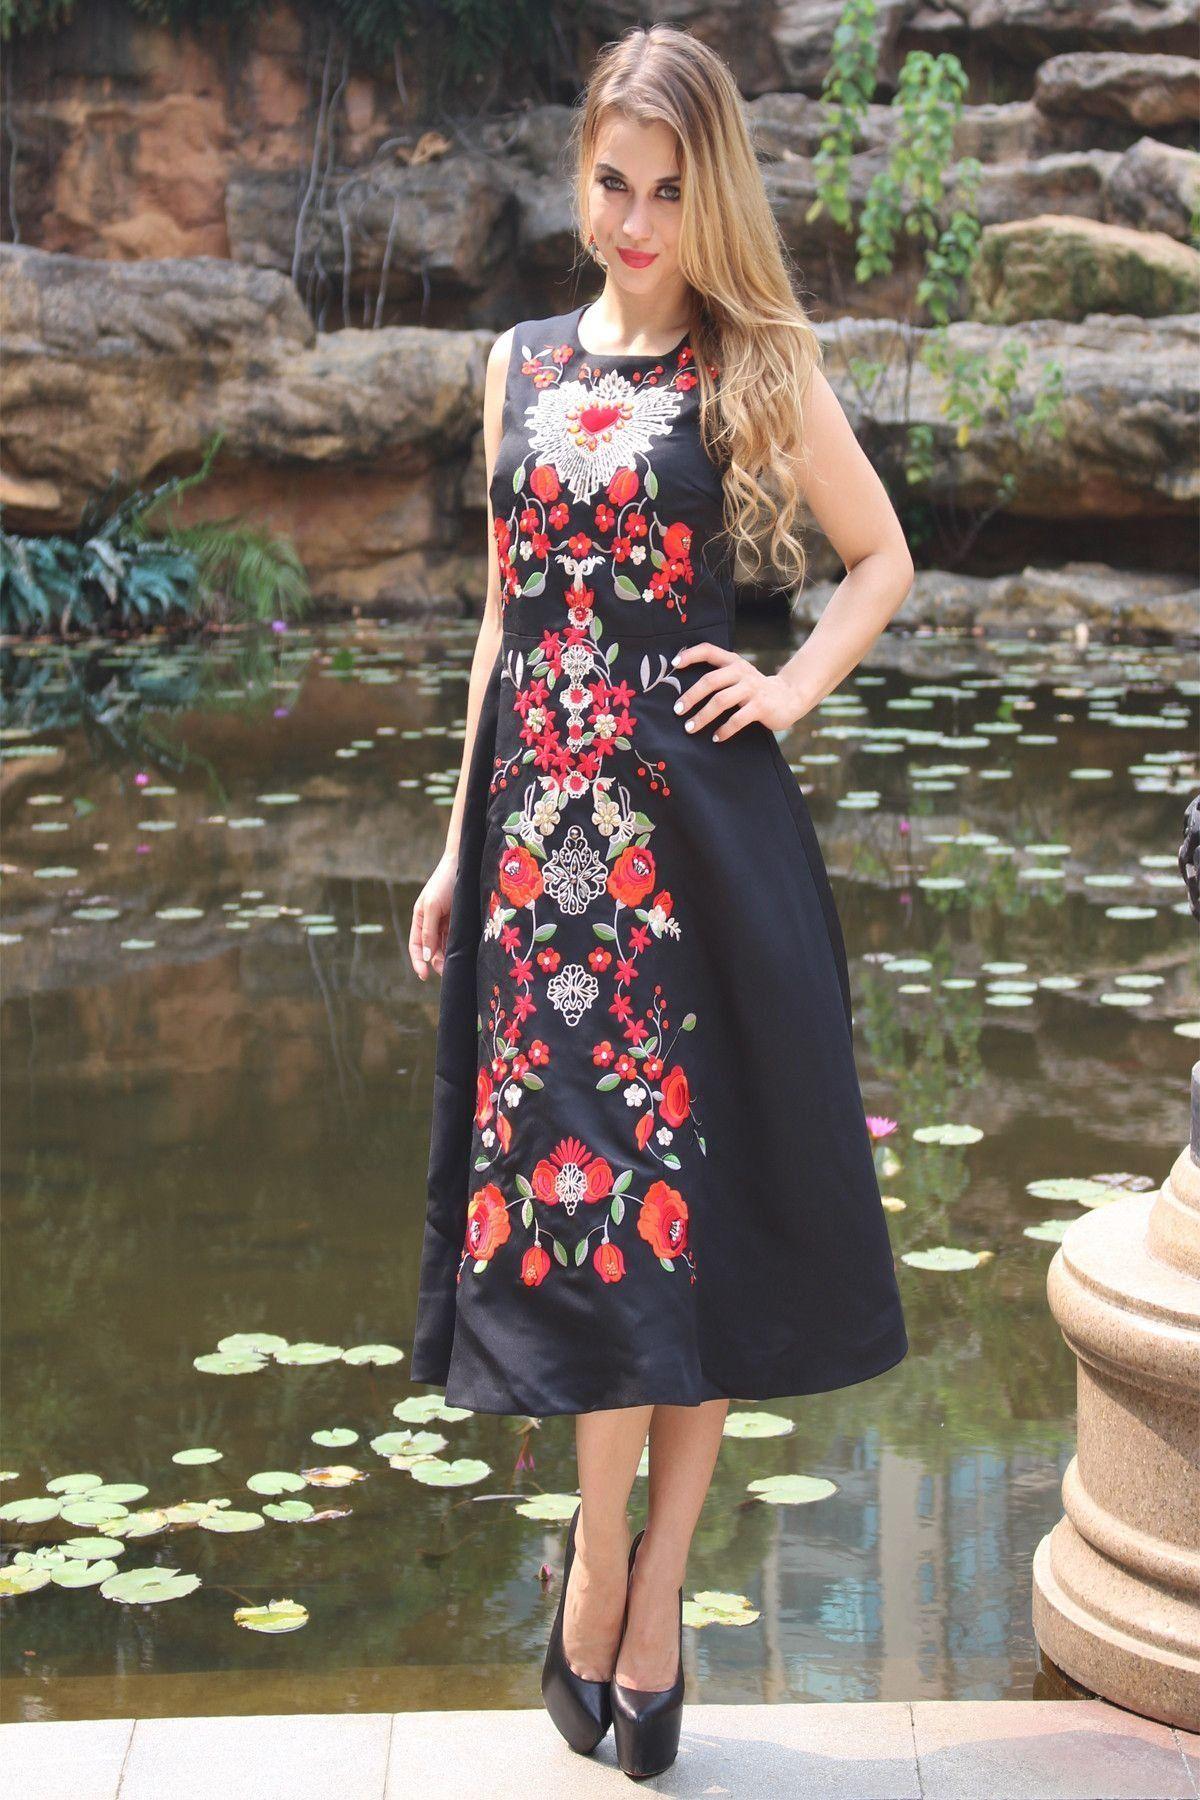 Classy Dress Black Dress With Embroidered Flowers 1000 Classy Dress Elegant Dresses Classy Vintage Classy Dress Elegant [ 1800 x 1200 Pixel ]